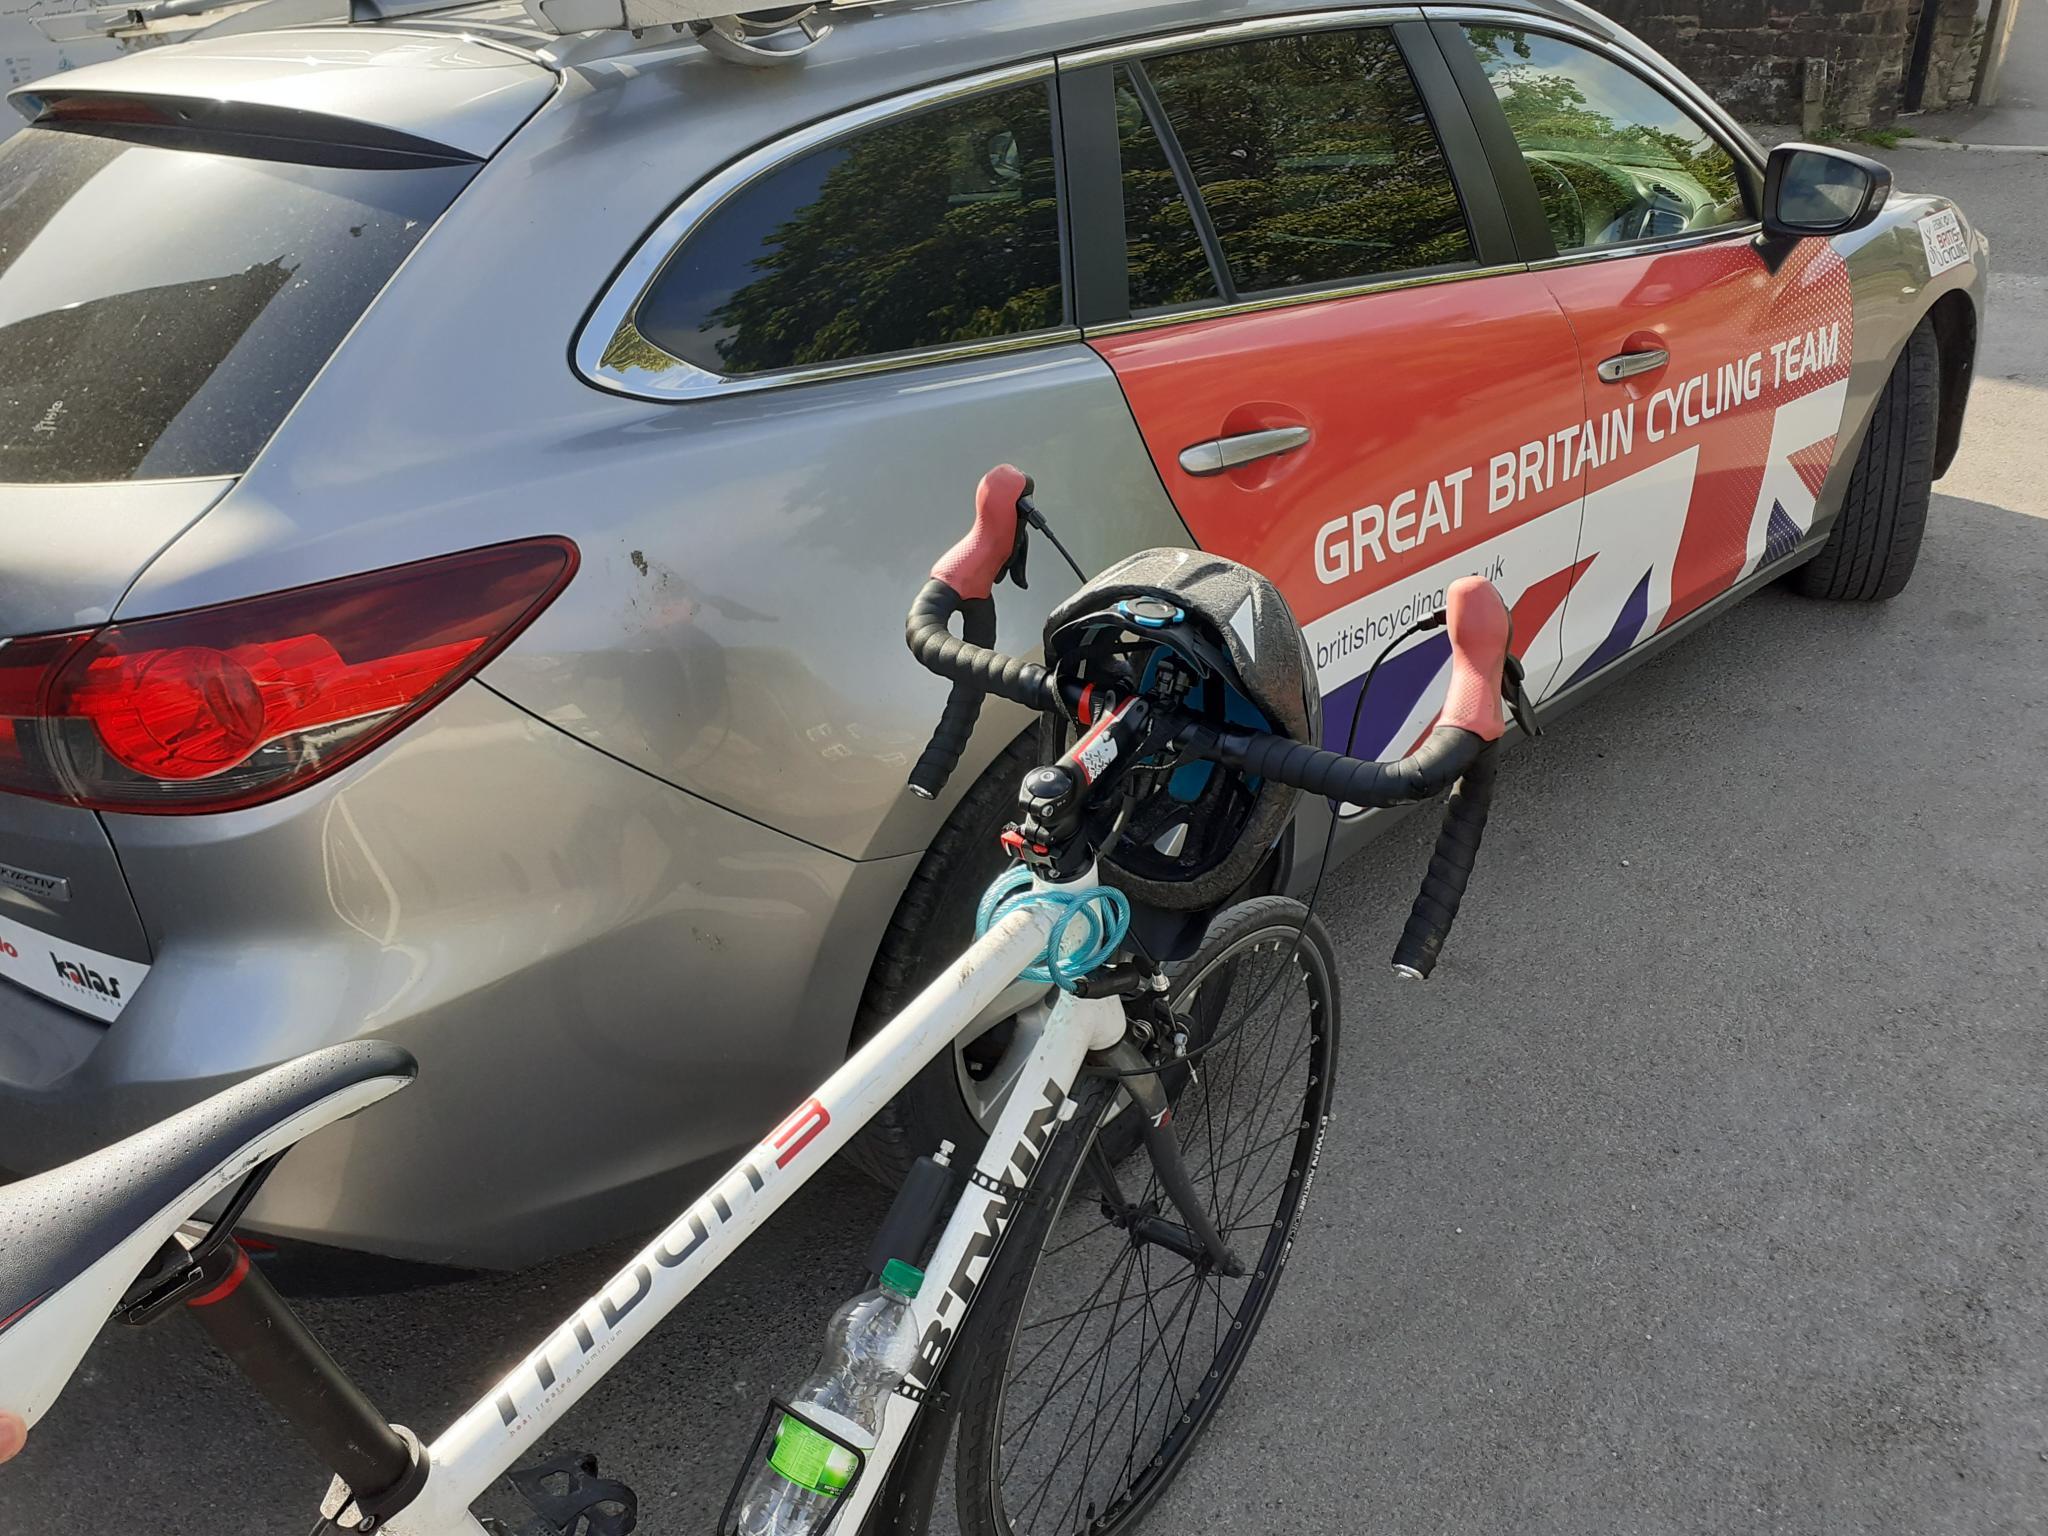 On my bike-20200524_173421-jpg